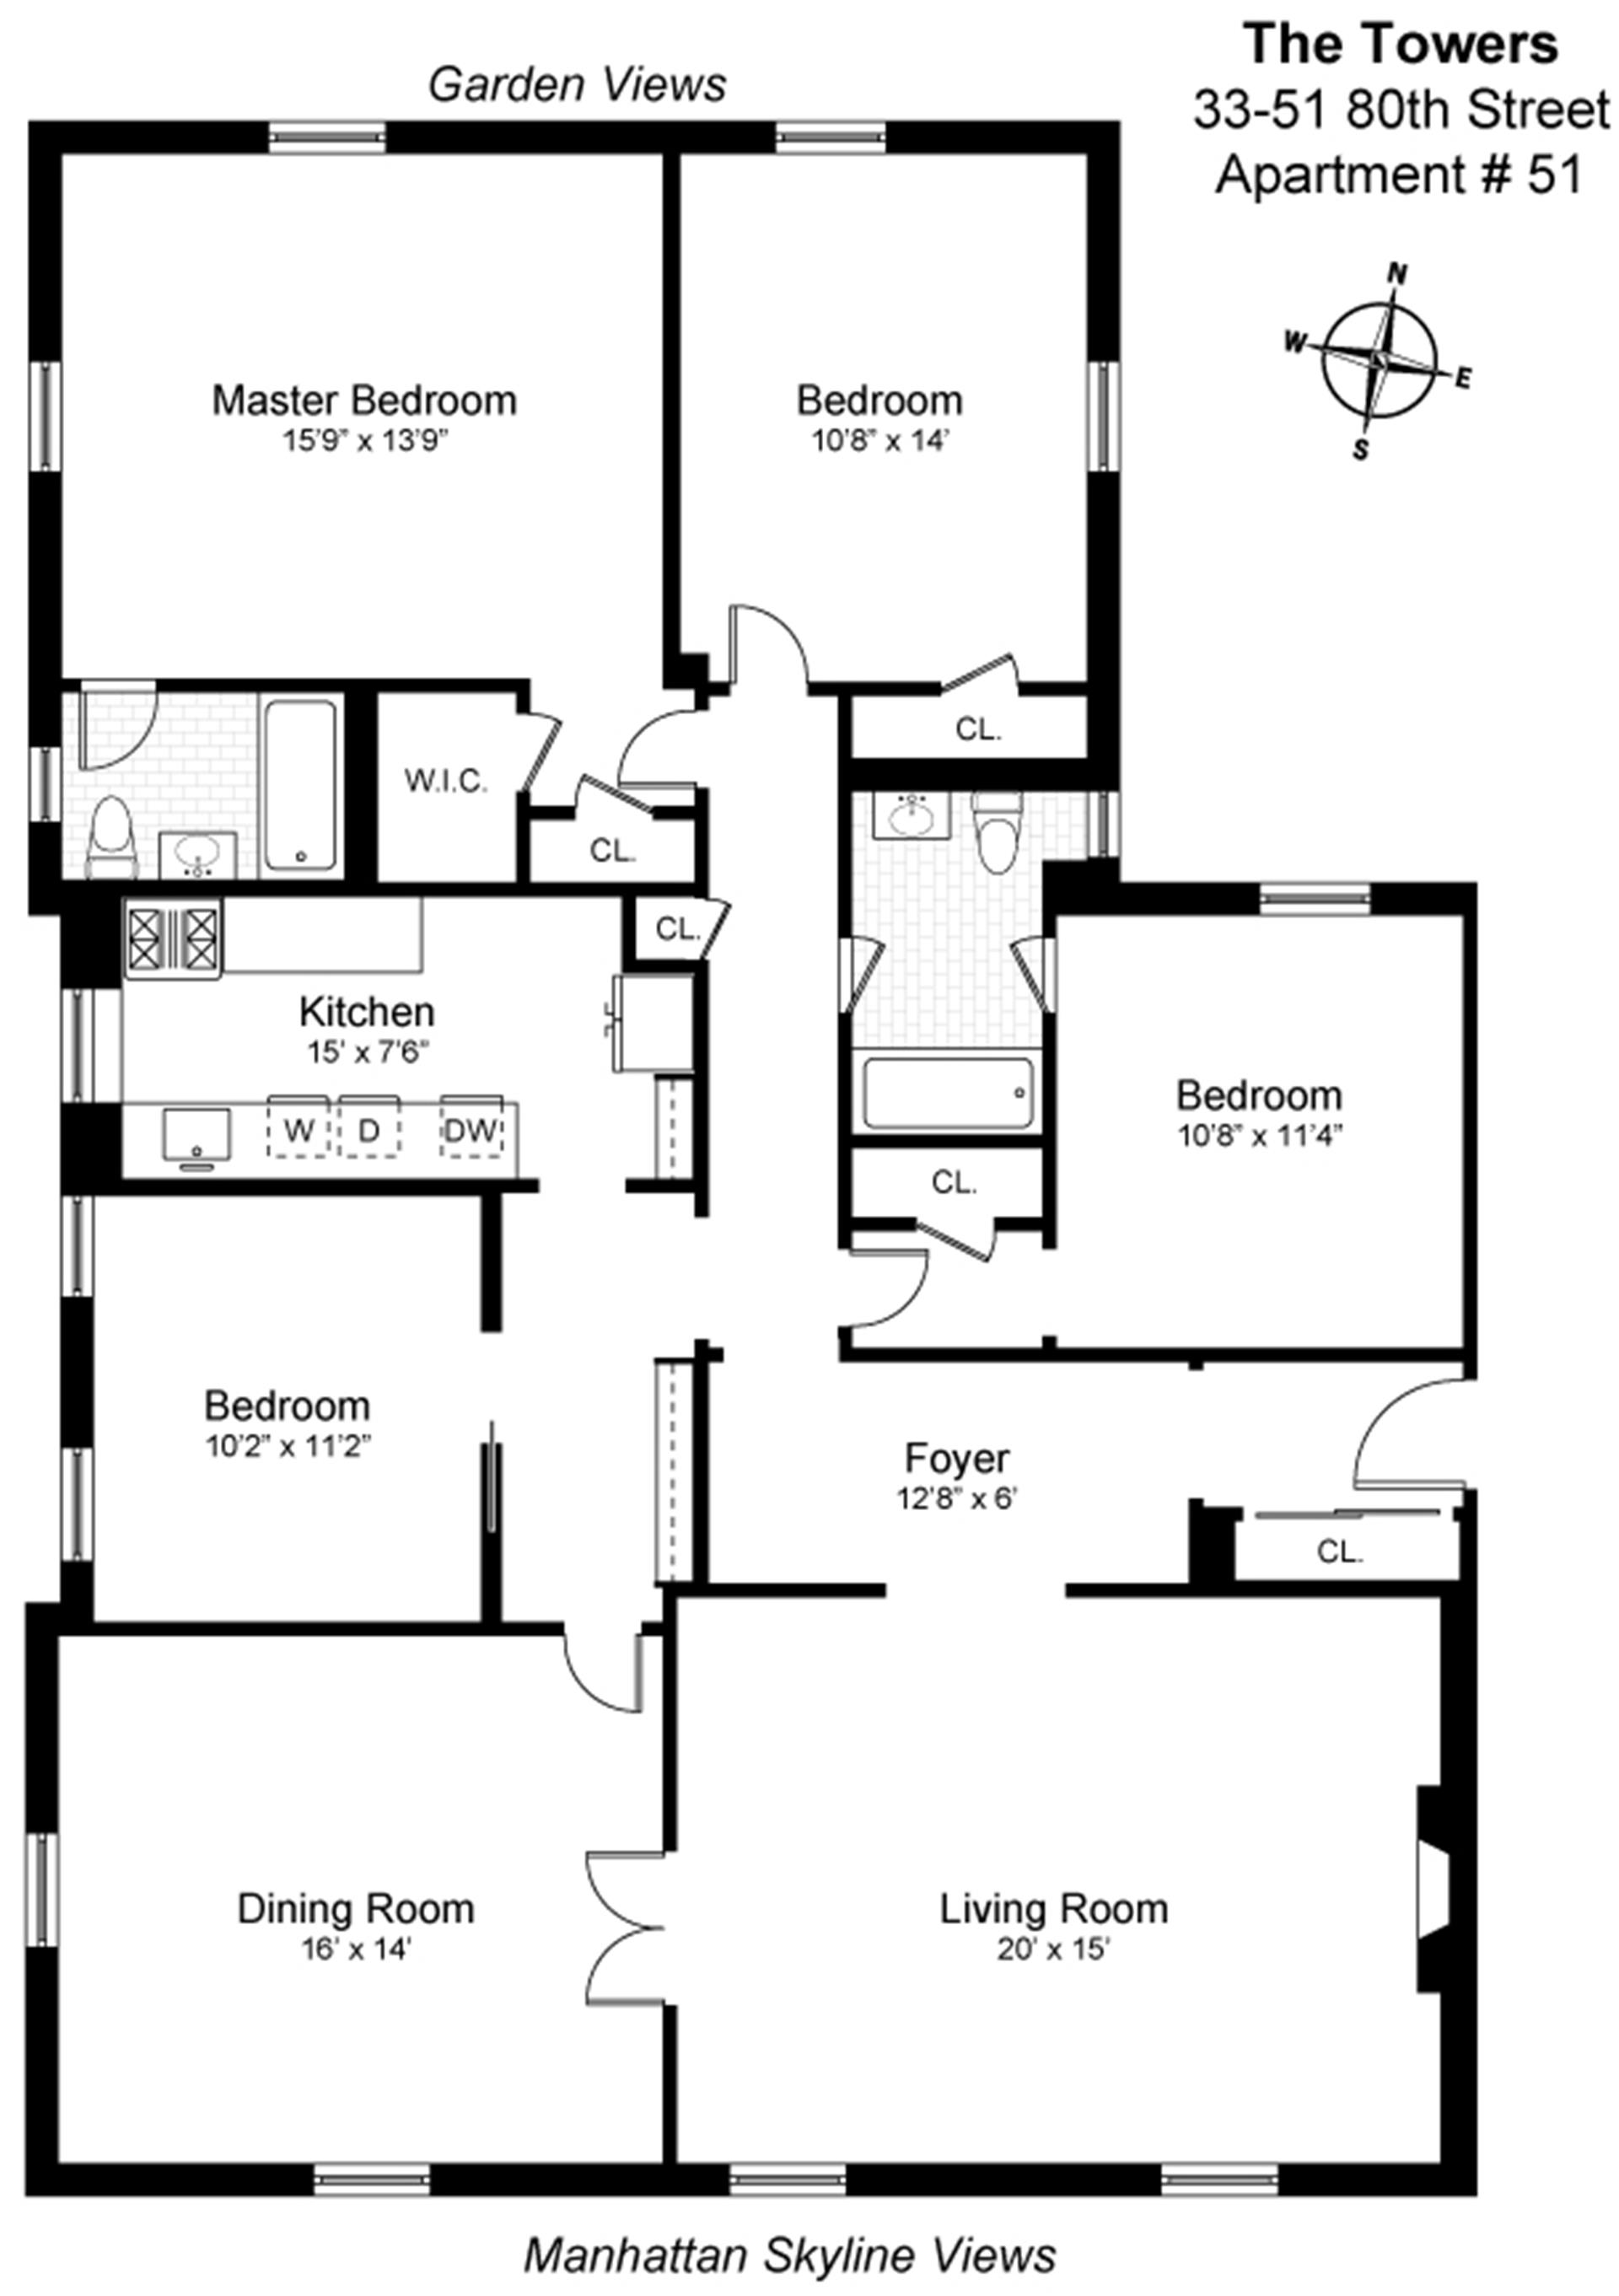 Floor plan of 33-51 80th St, 51 - Jackson Heights, New York